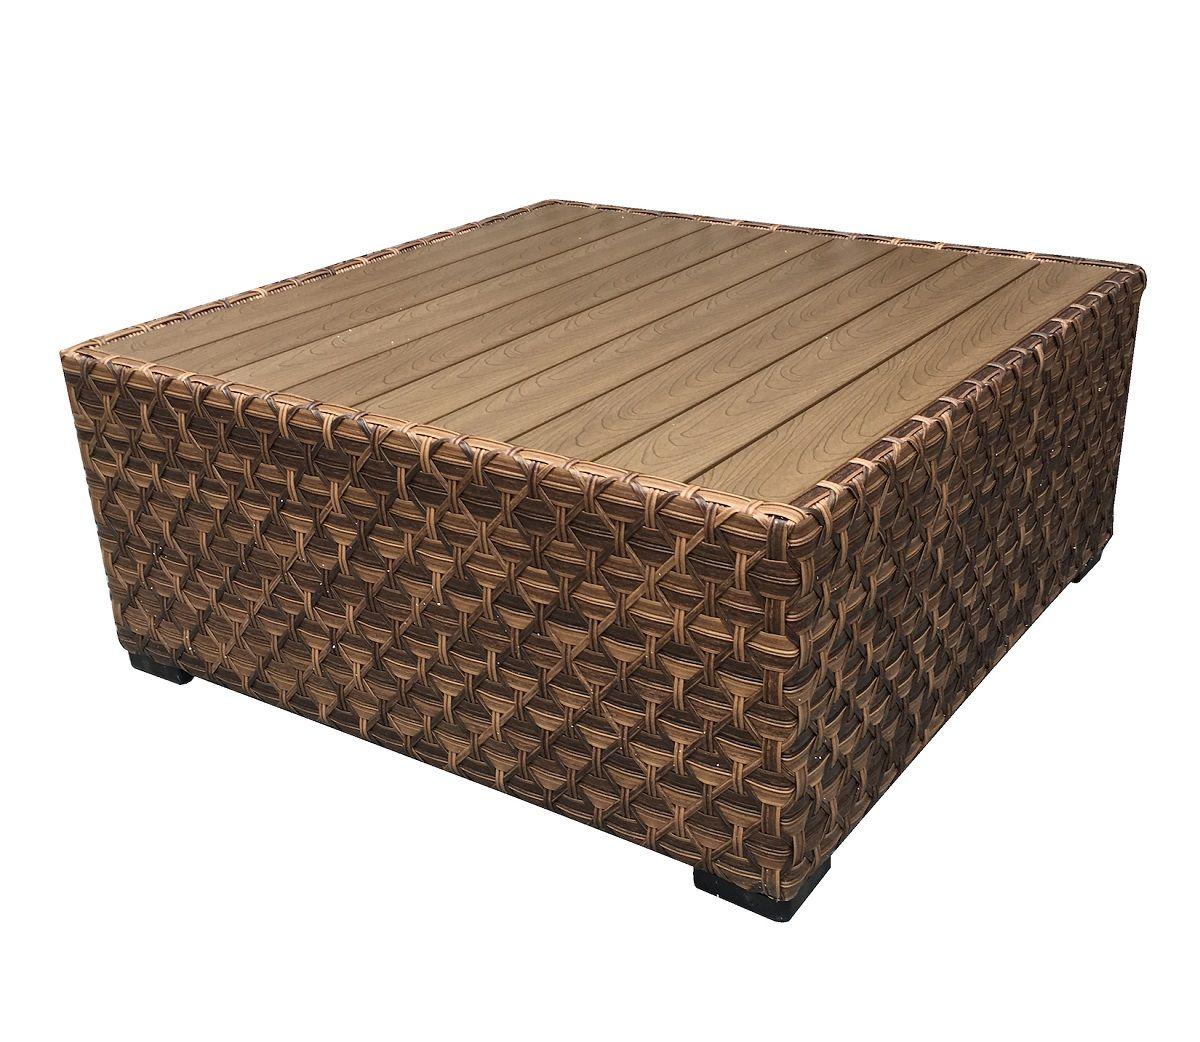 12+ Wicker storage patio coffee table ideas in 2021